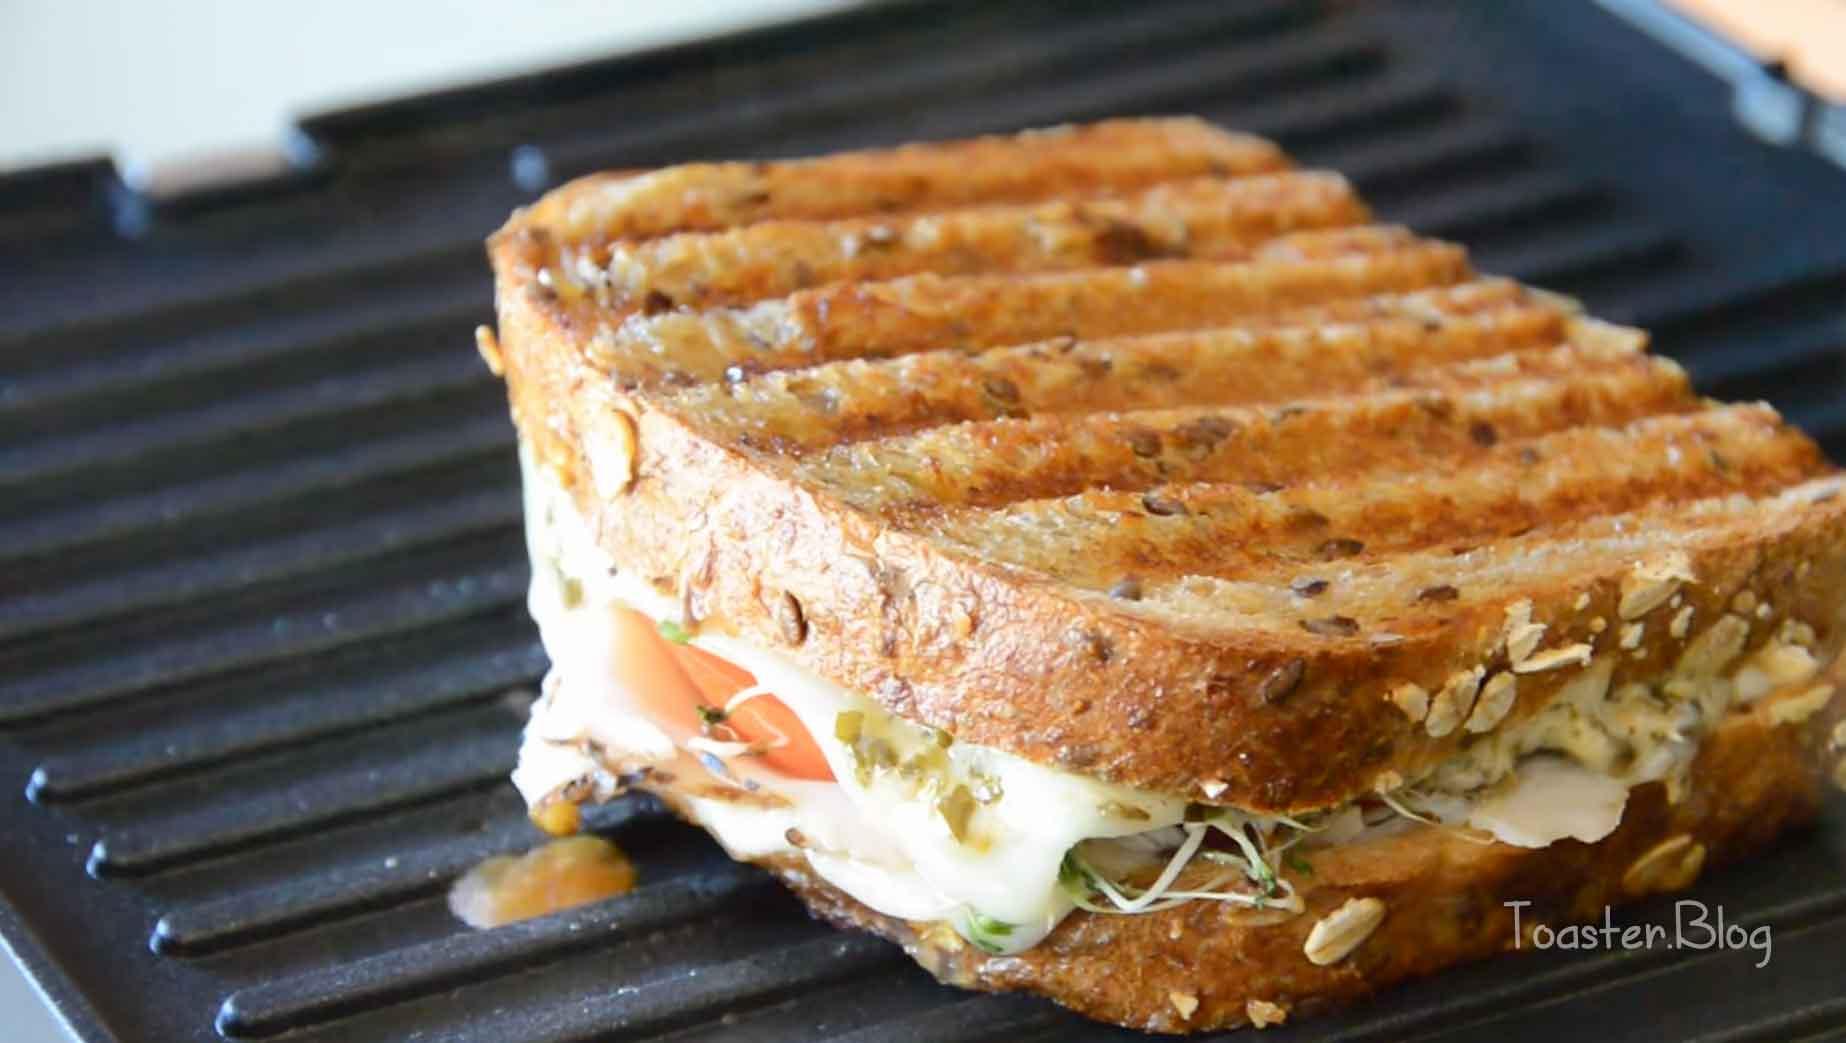 Best large sandwich toaster